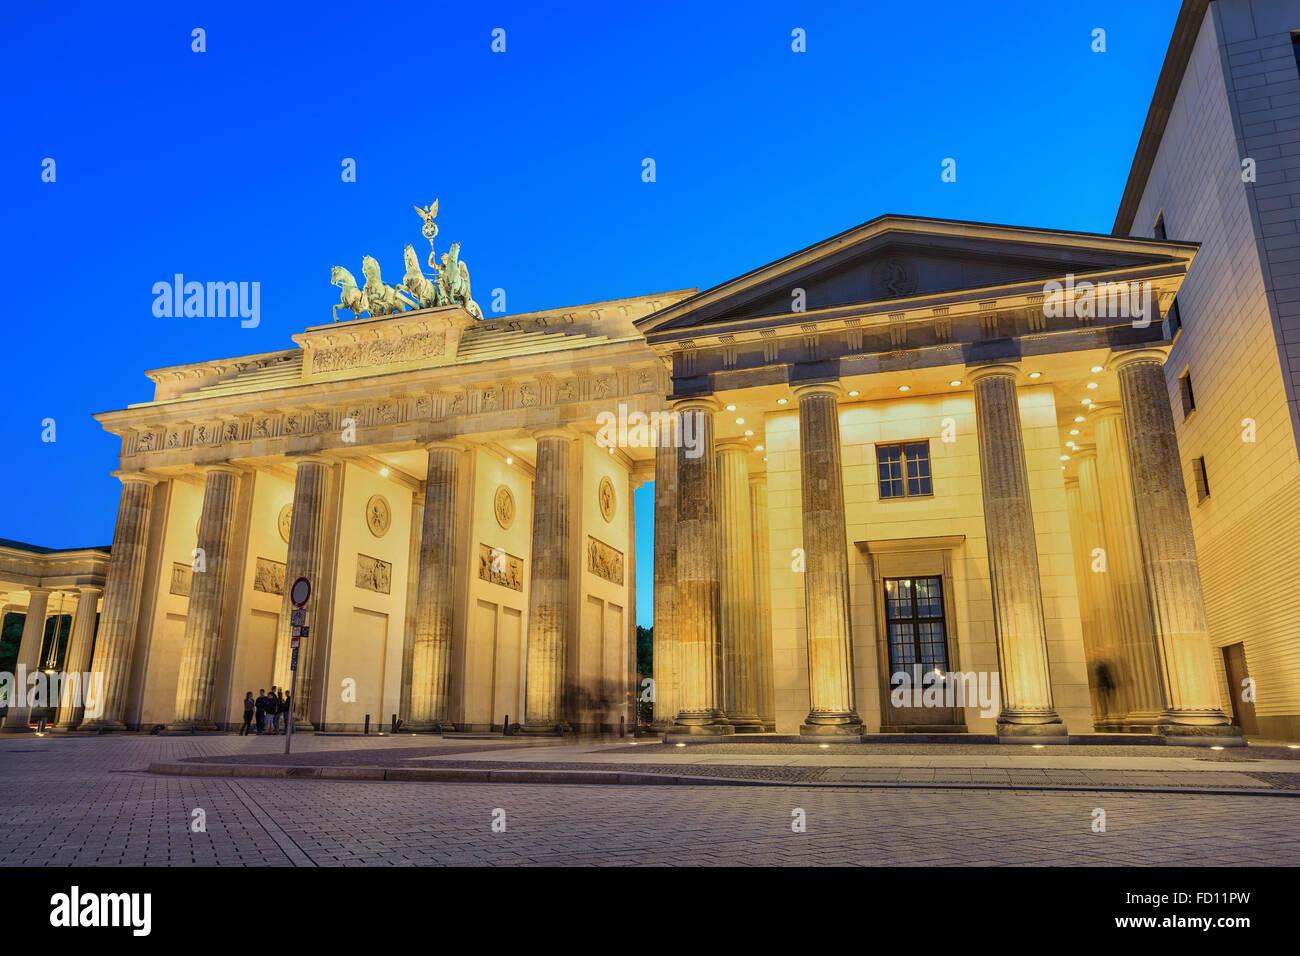 Puerta de Brandenburgo , Berlín , Alemania Imagen De Stock